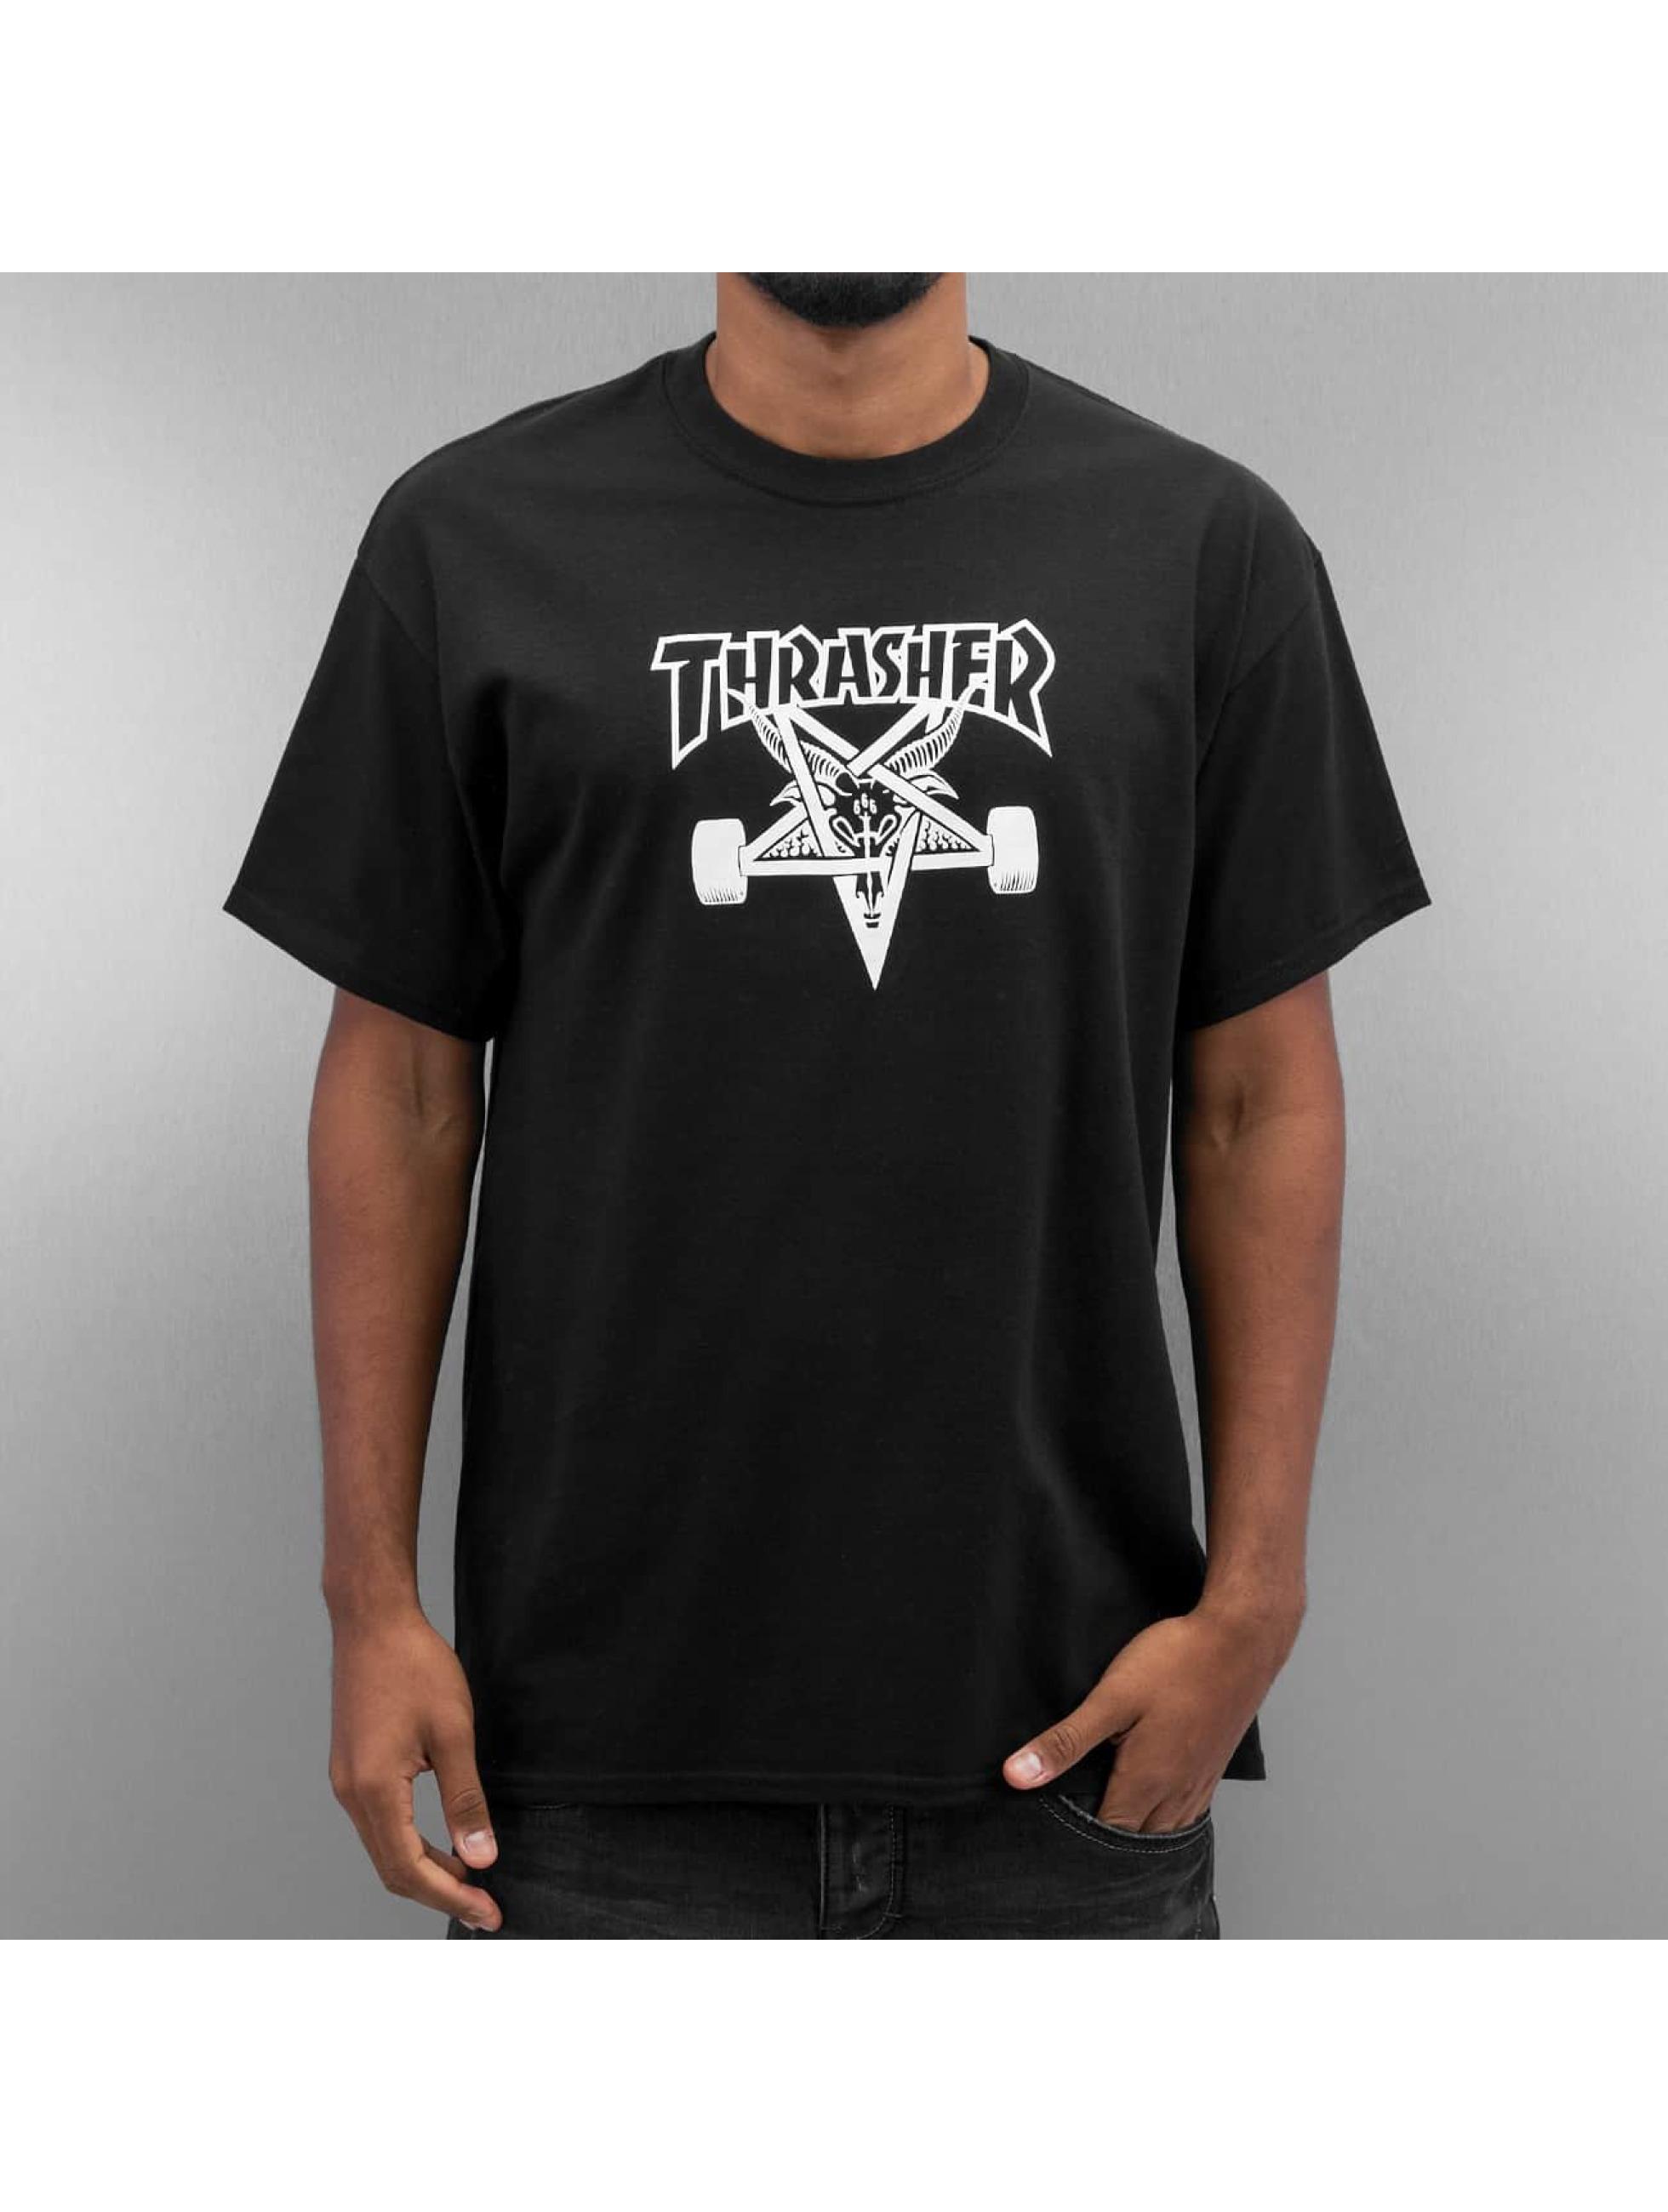 T-Shirt Skategoat in schwarz